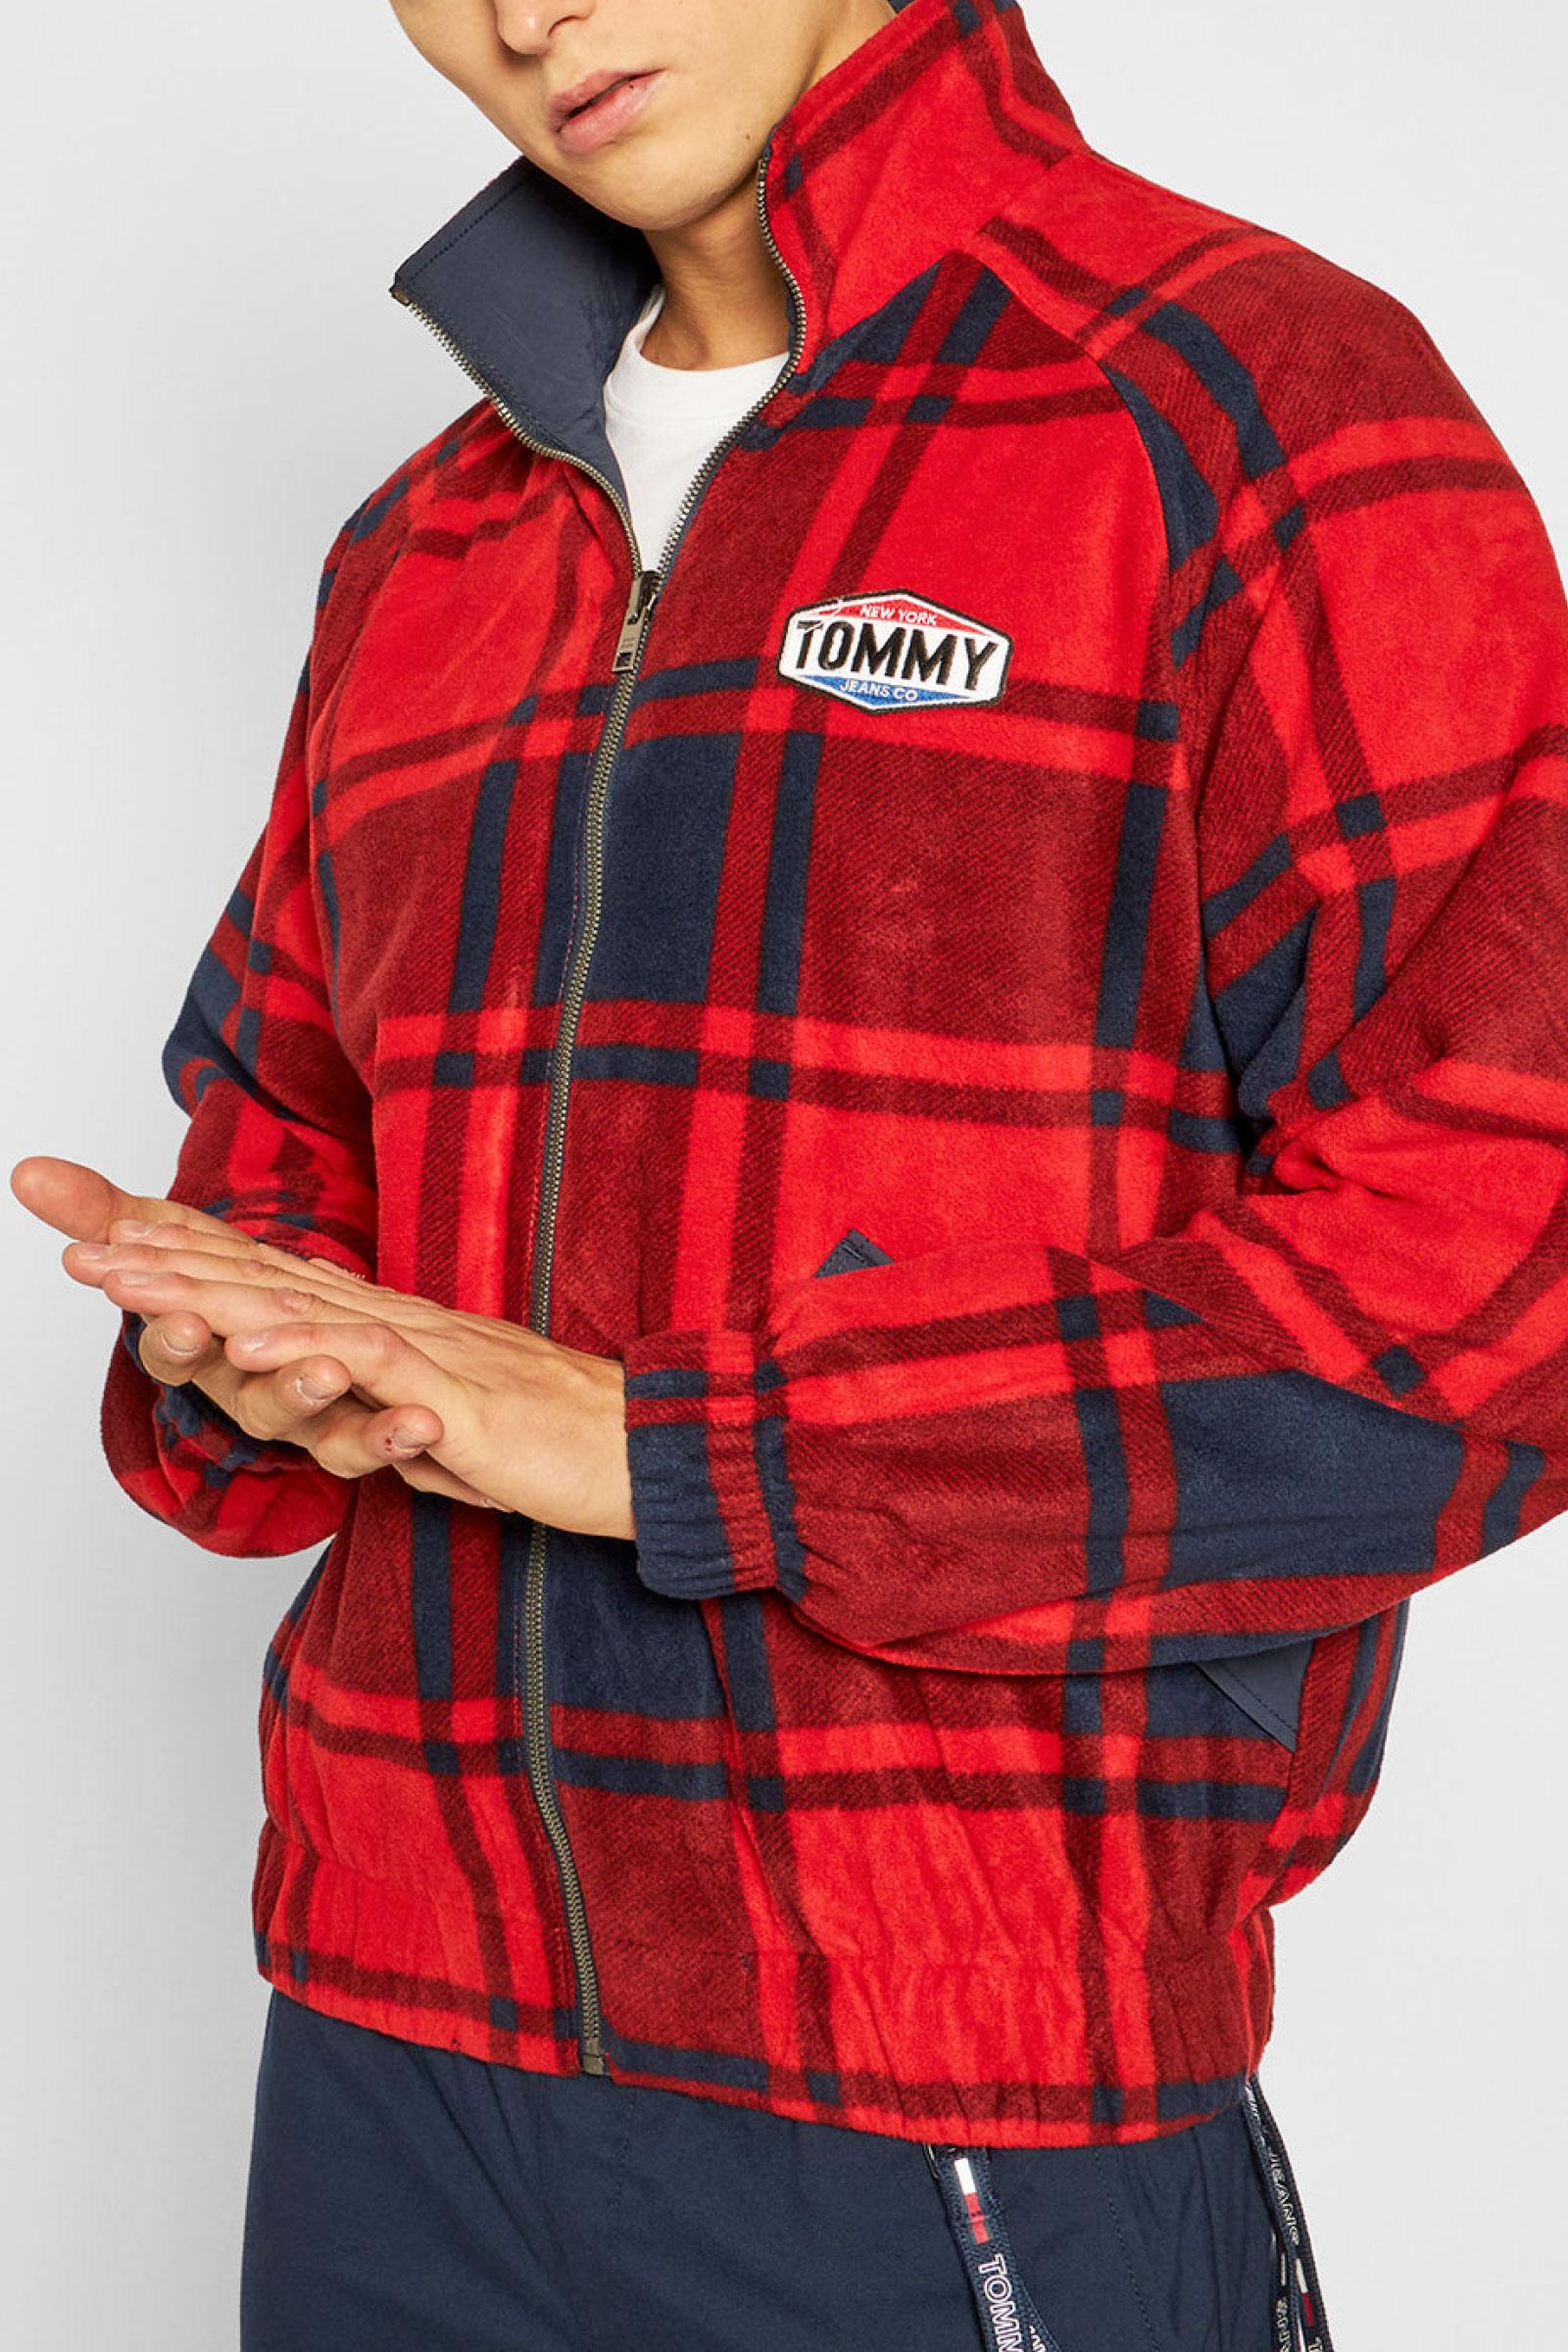 TOMMY JEANS Doubleface Man Jacket TOMMY JEANS | Jacket | DM0DM08425TJM